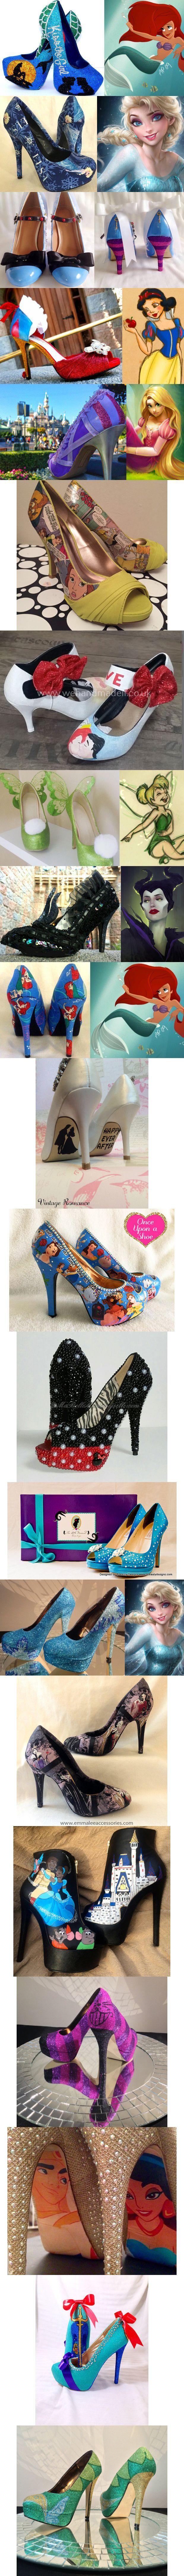 25 Disney Princess Inspired High Heel Shoes